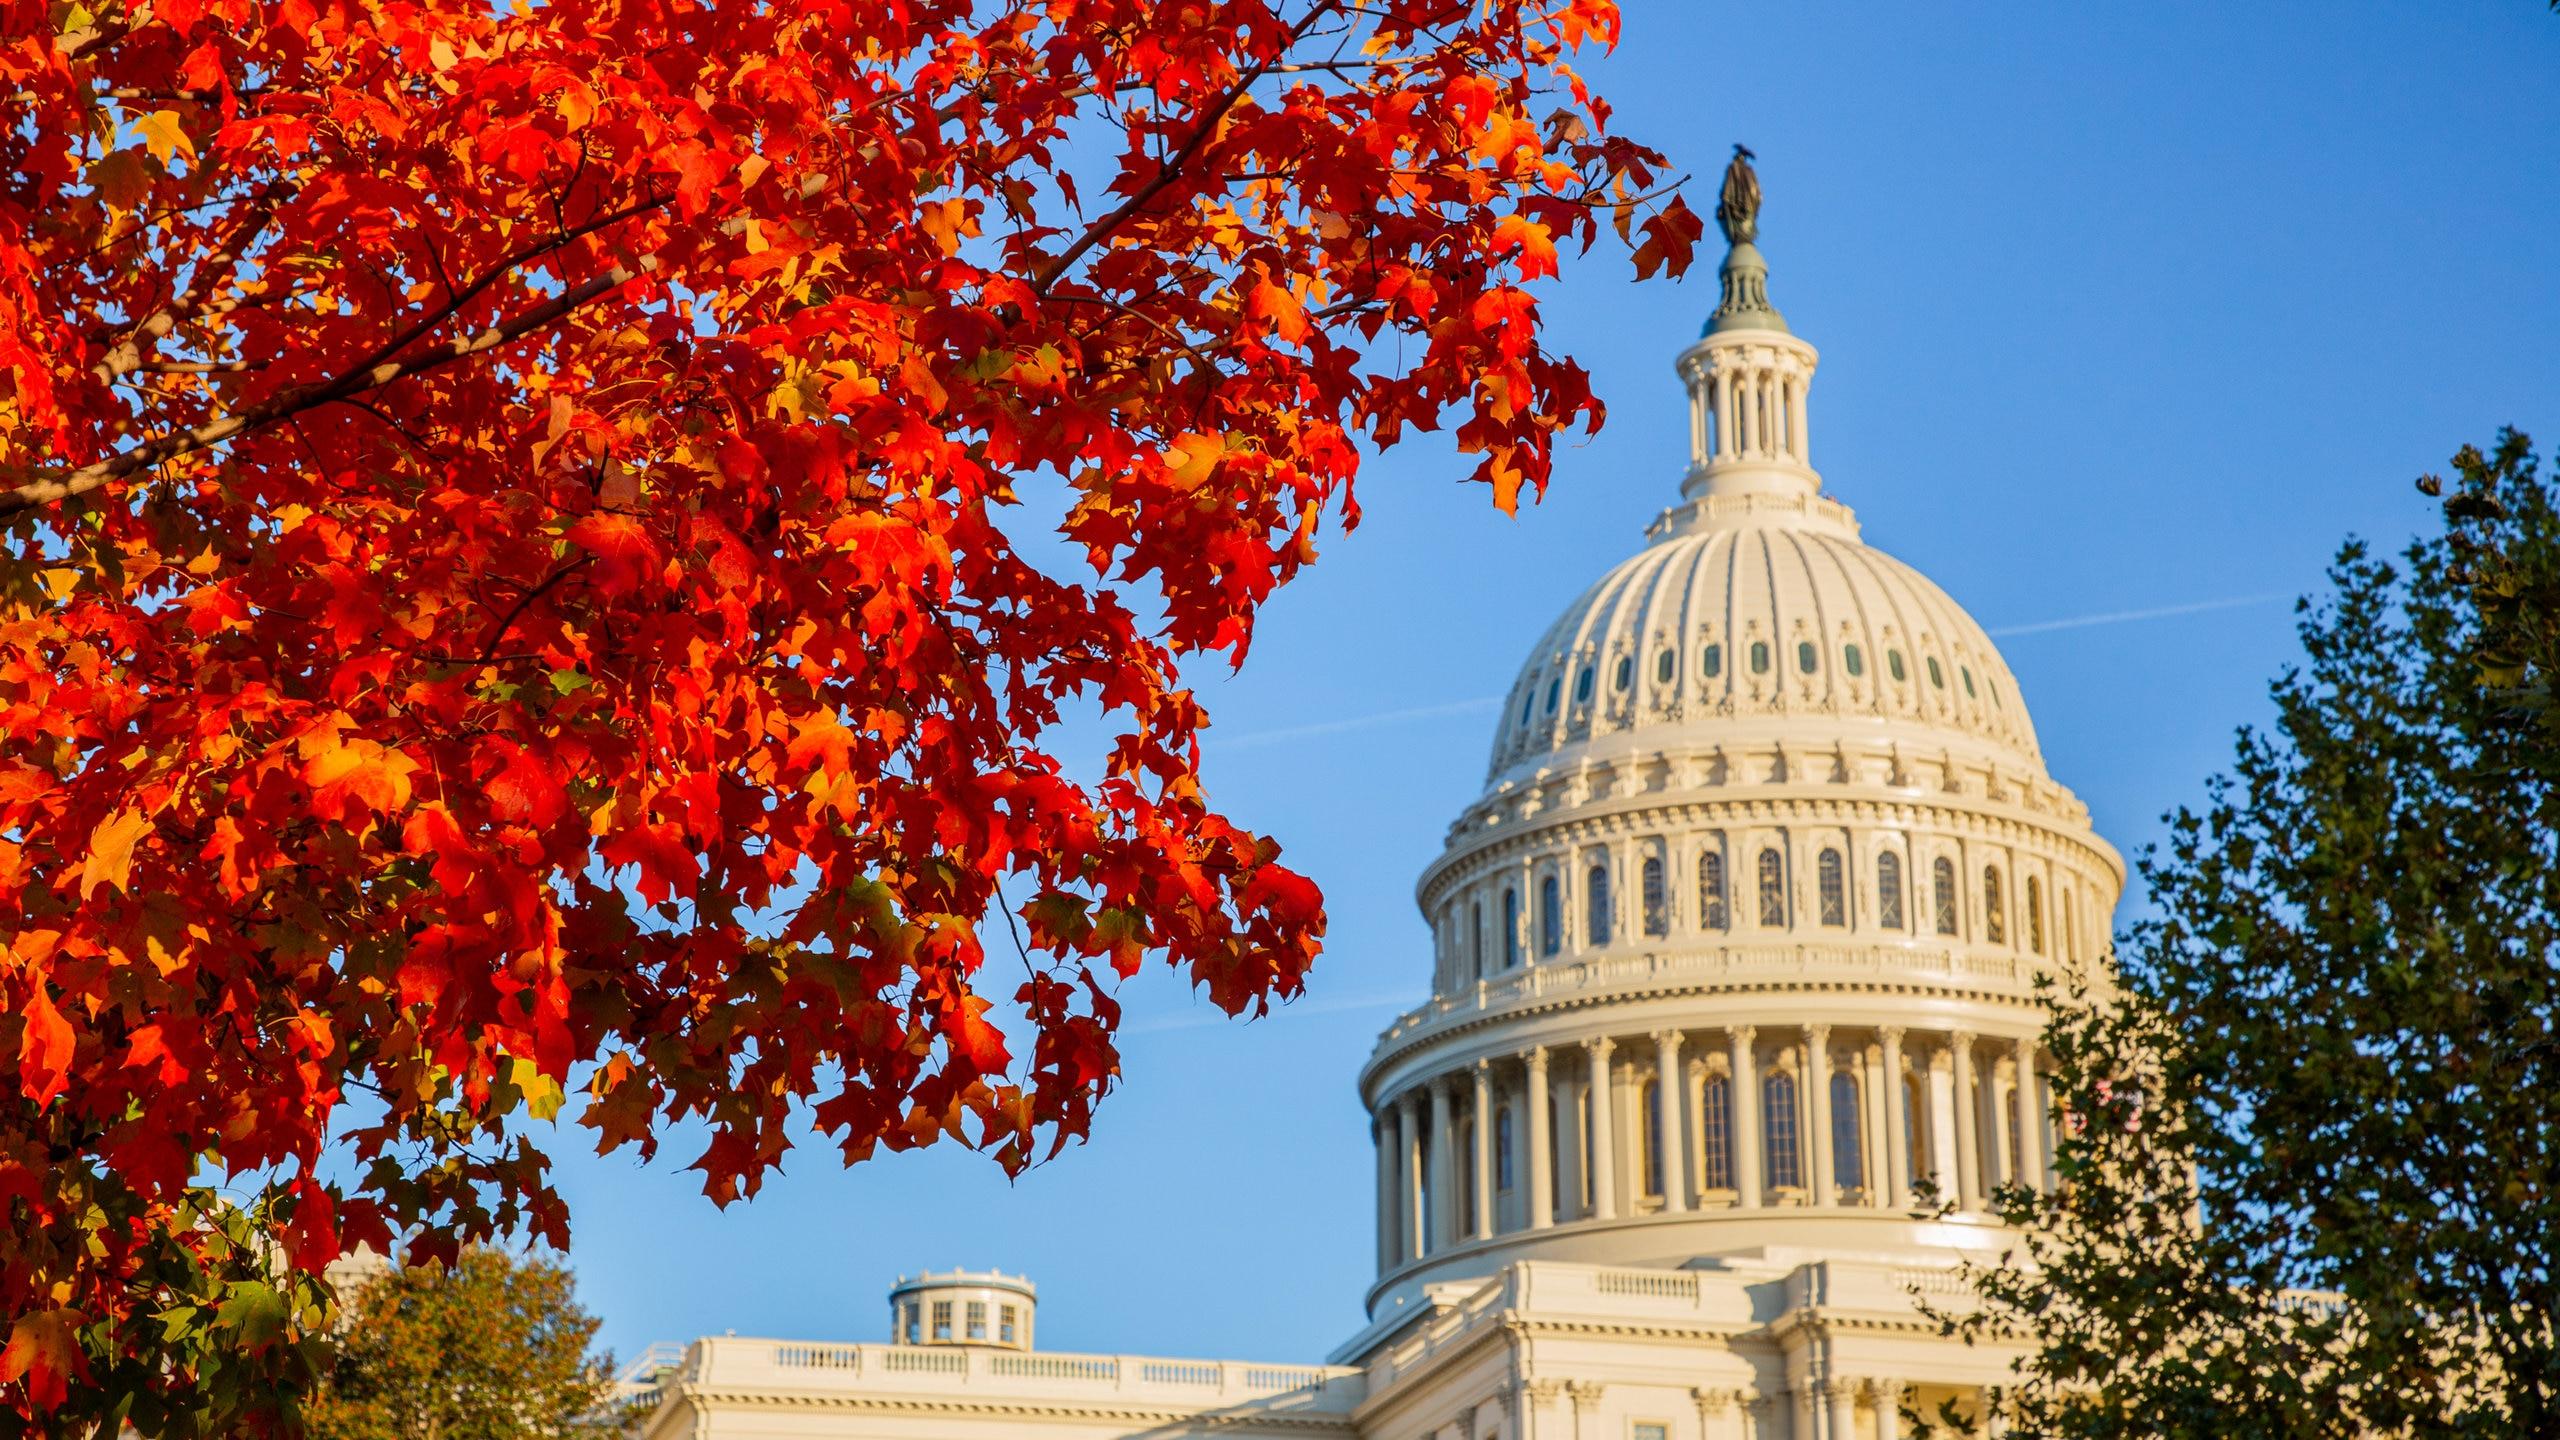 United States Capitol, Washington, District of Columbia, United States of America